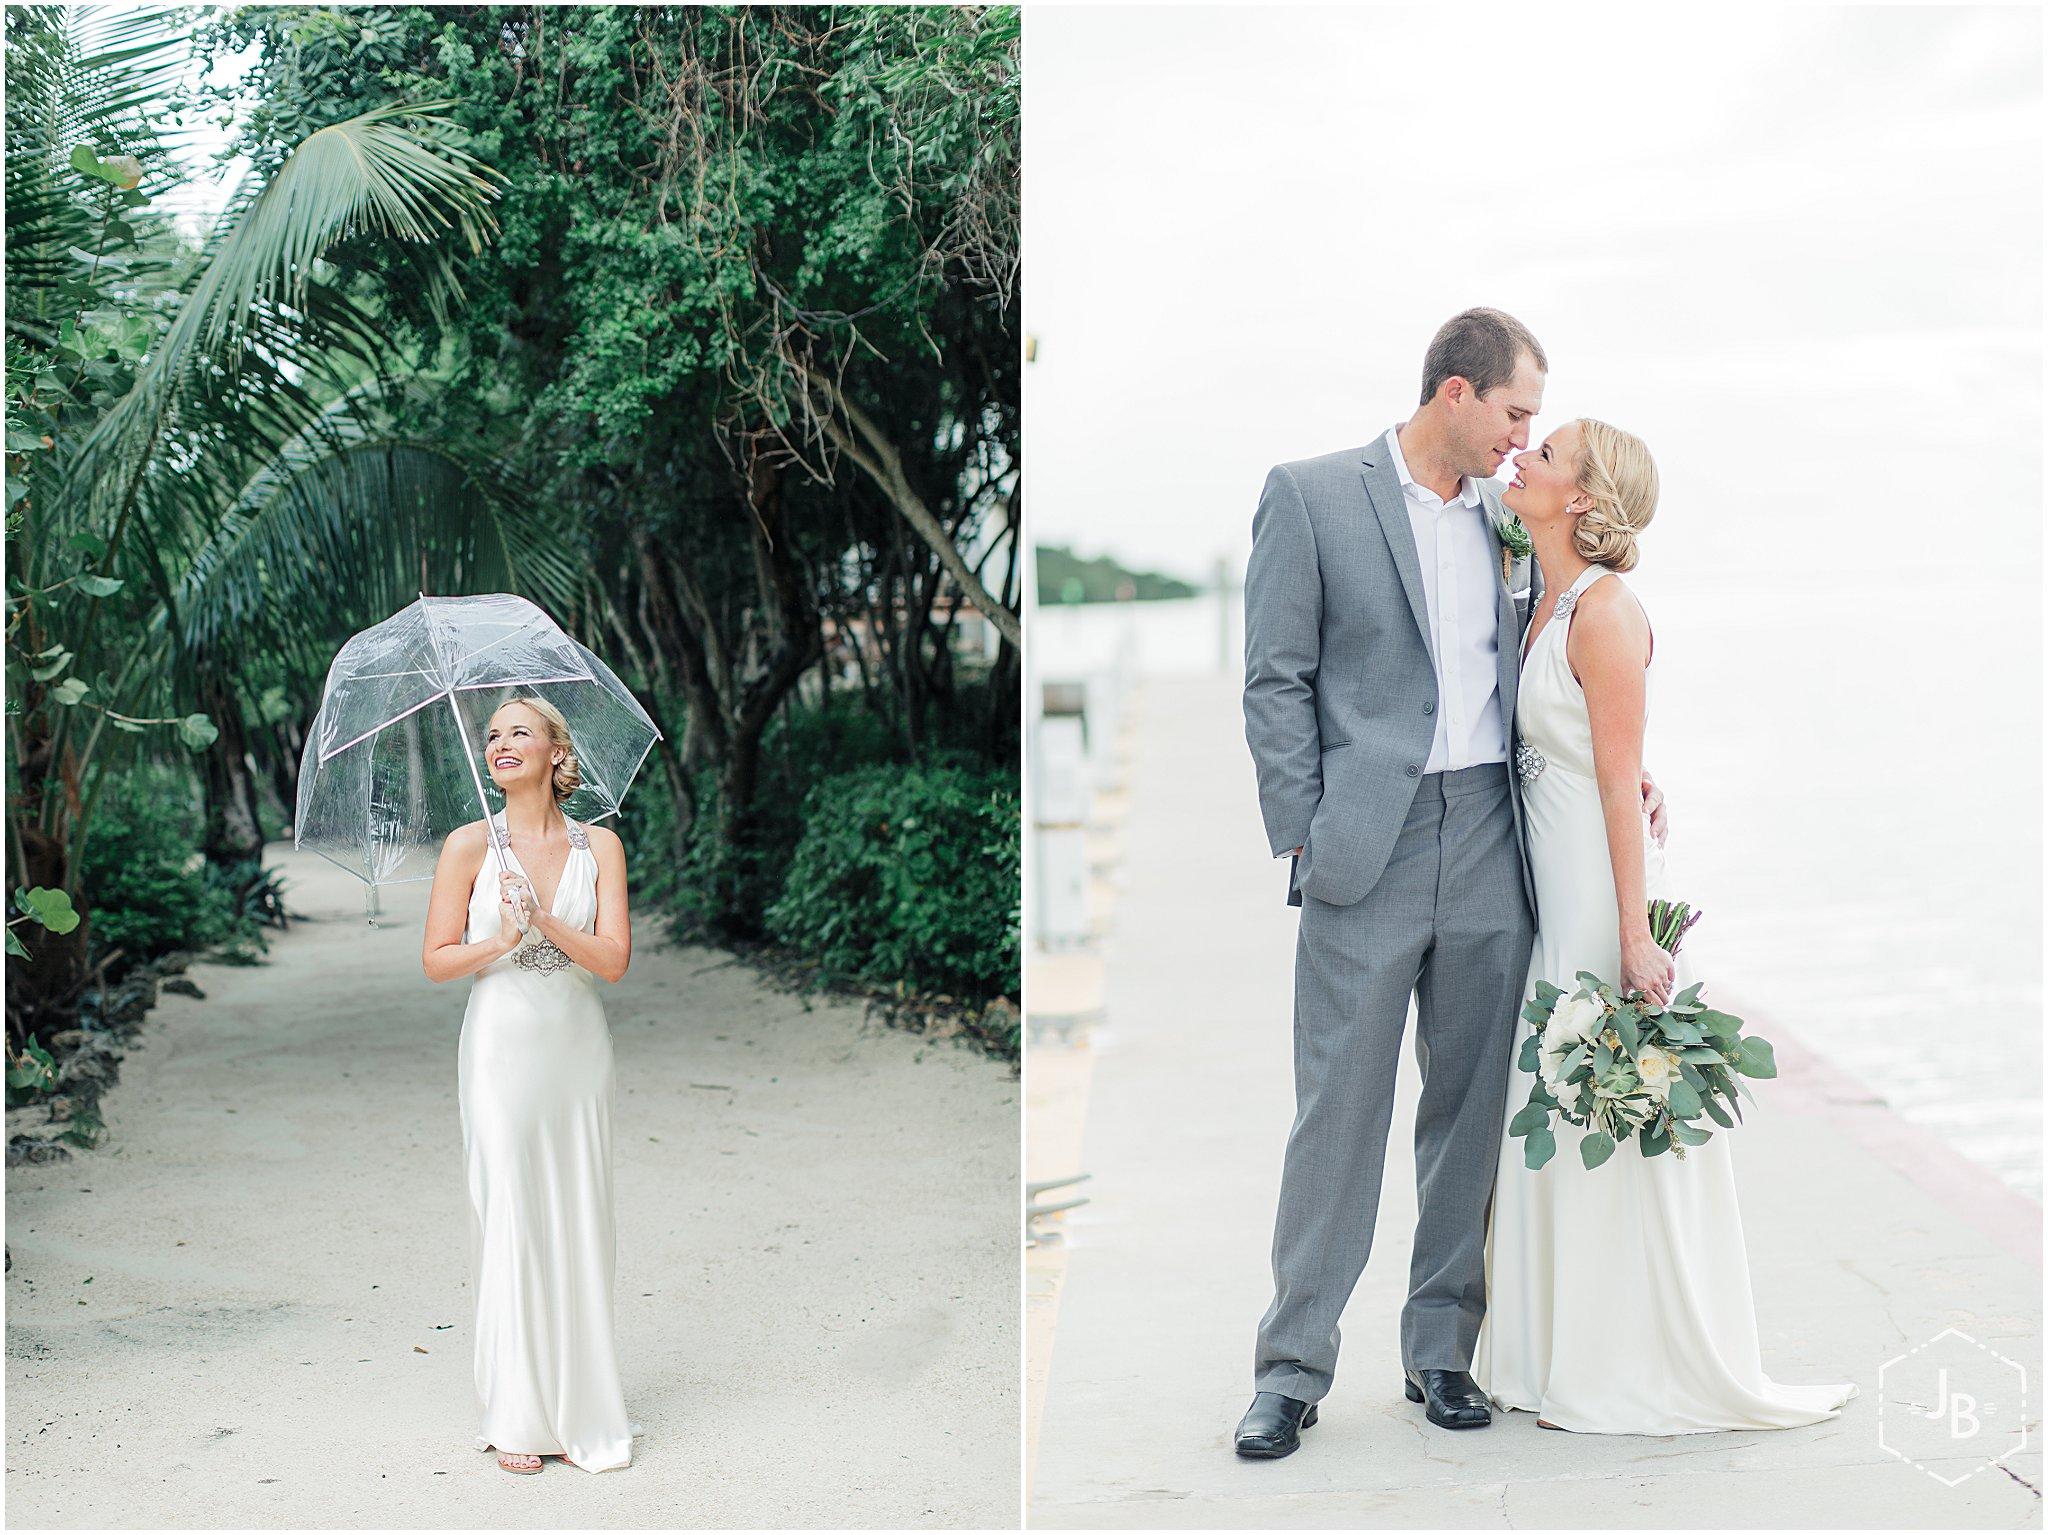 WeddingandEngagementFloridaPhotographer_1111.jpg